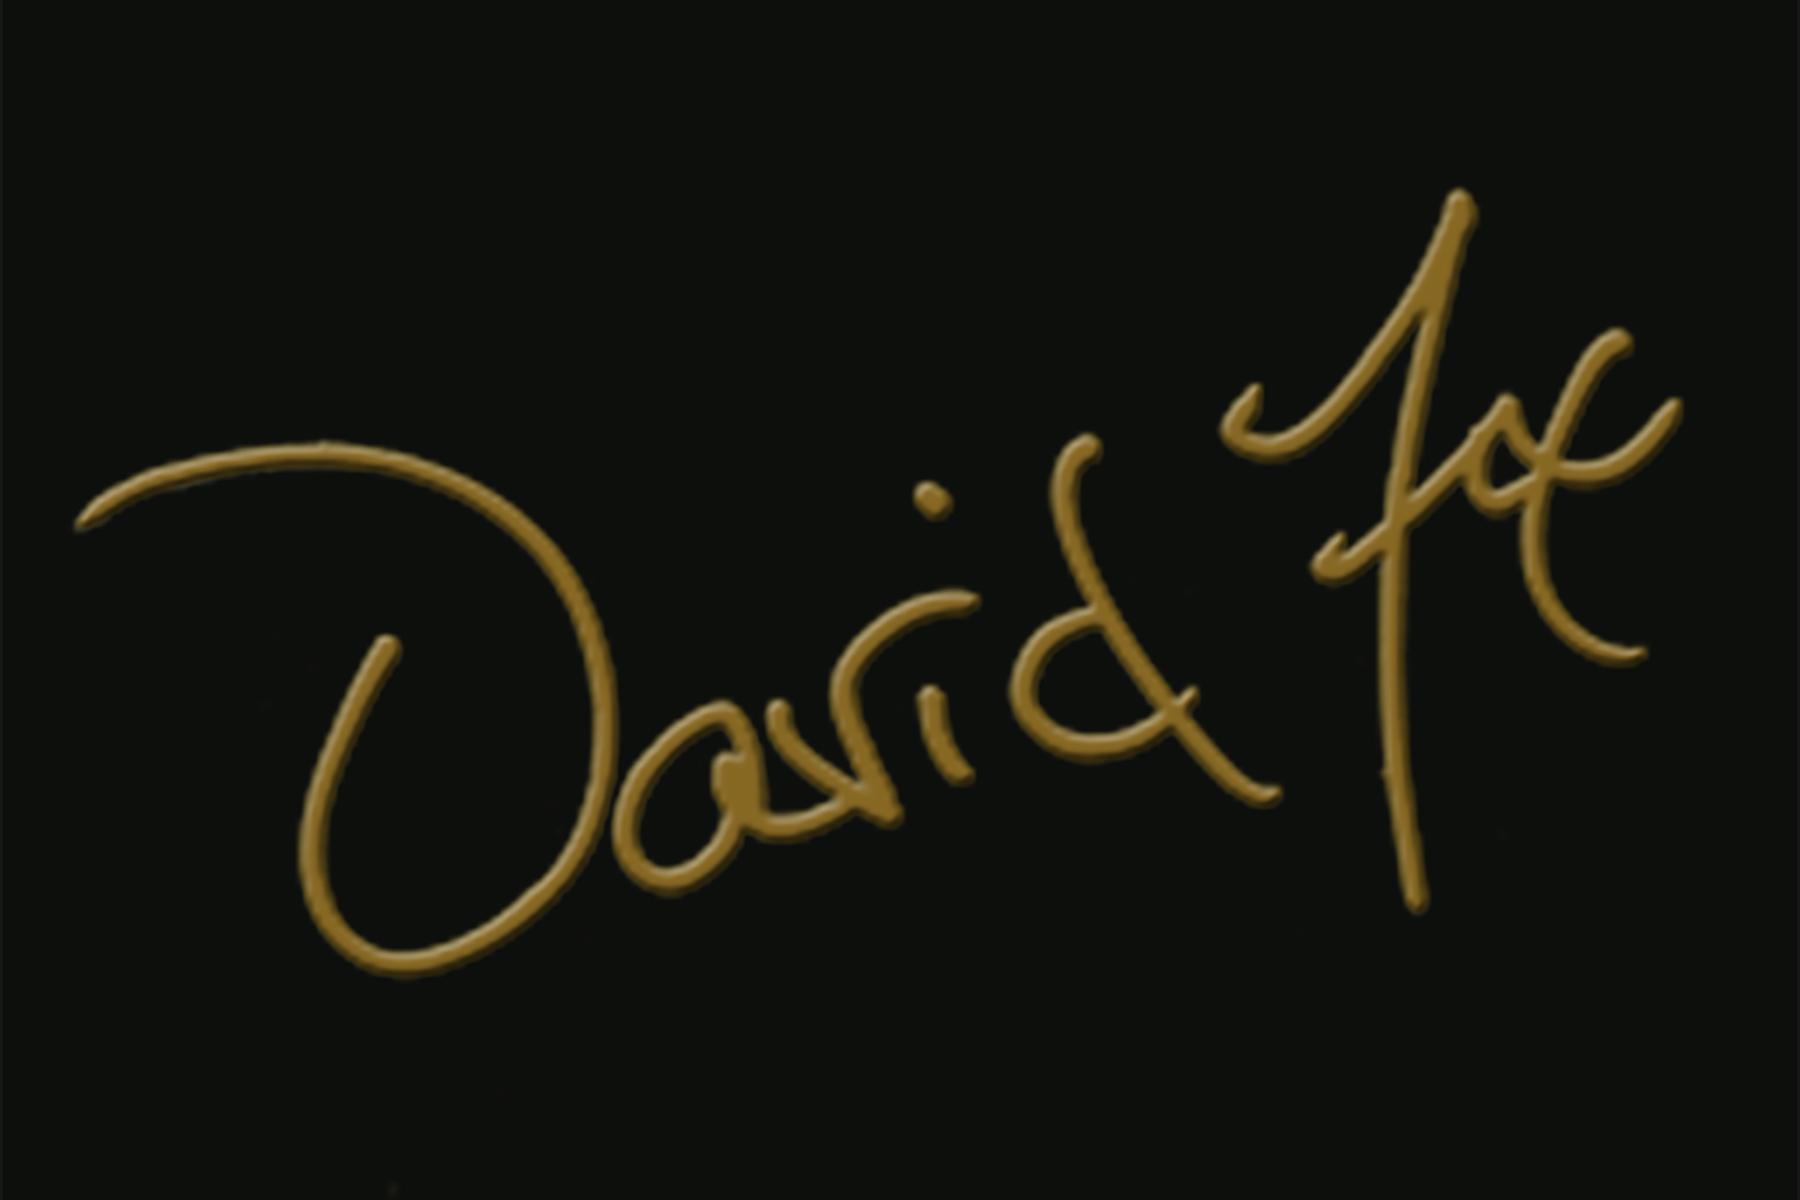 davidfoxphotographer.photostockplus.com